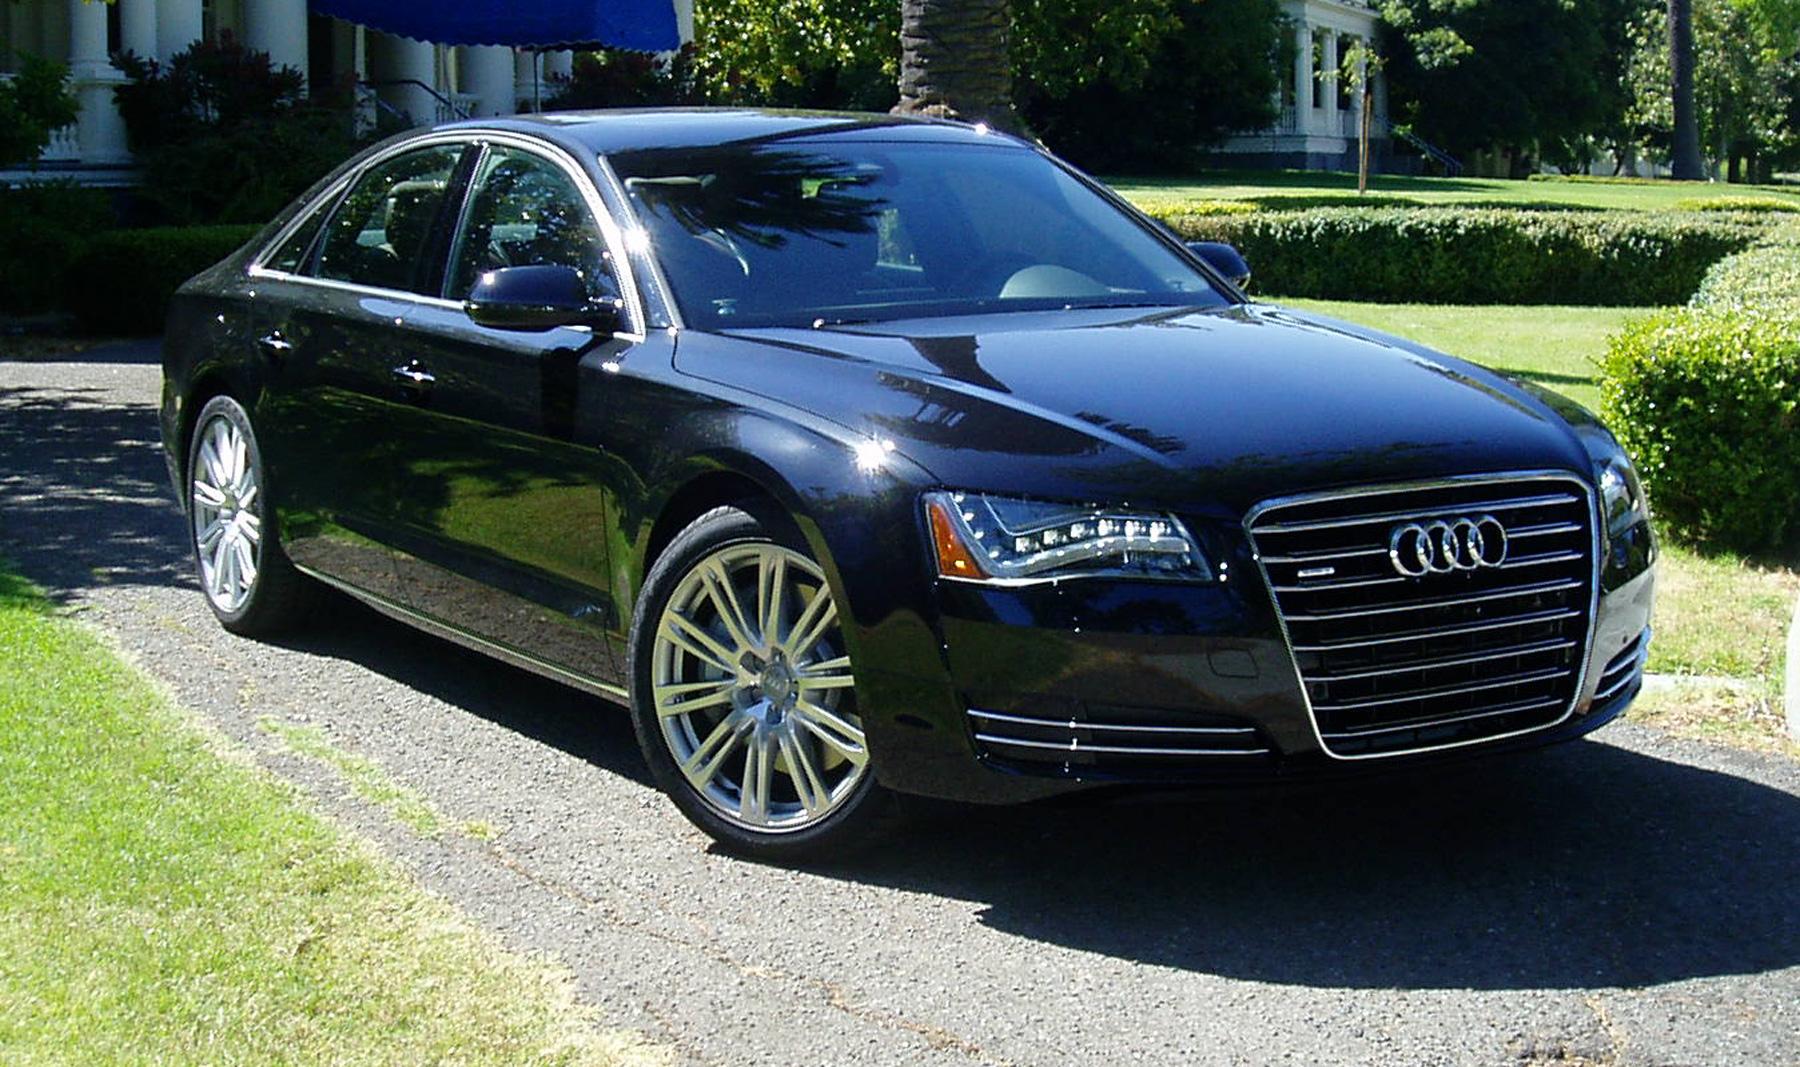 2011 Audi A8 Image 16